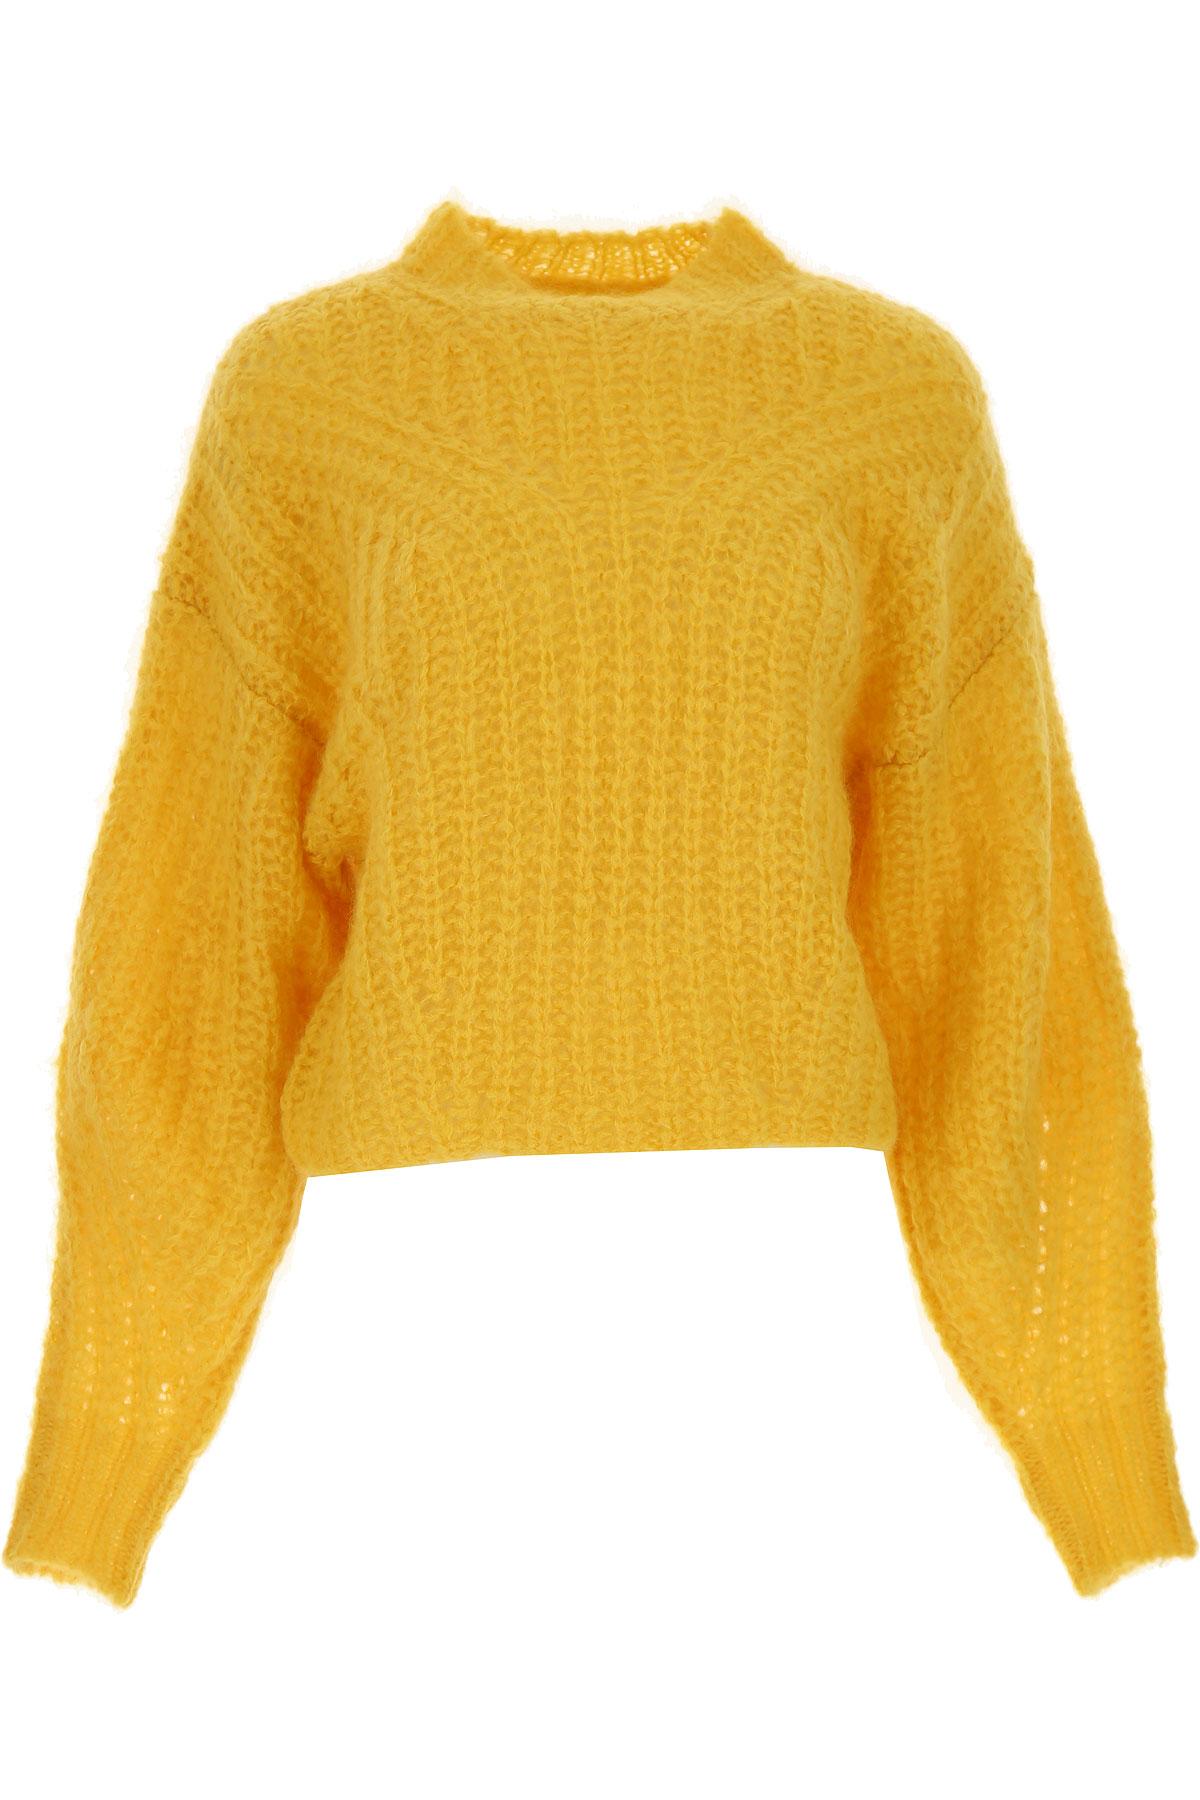 Isabel Marant Sweater for Women Jumper On Sale, Sun, Super Kid mohair, 2019, 4 6